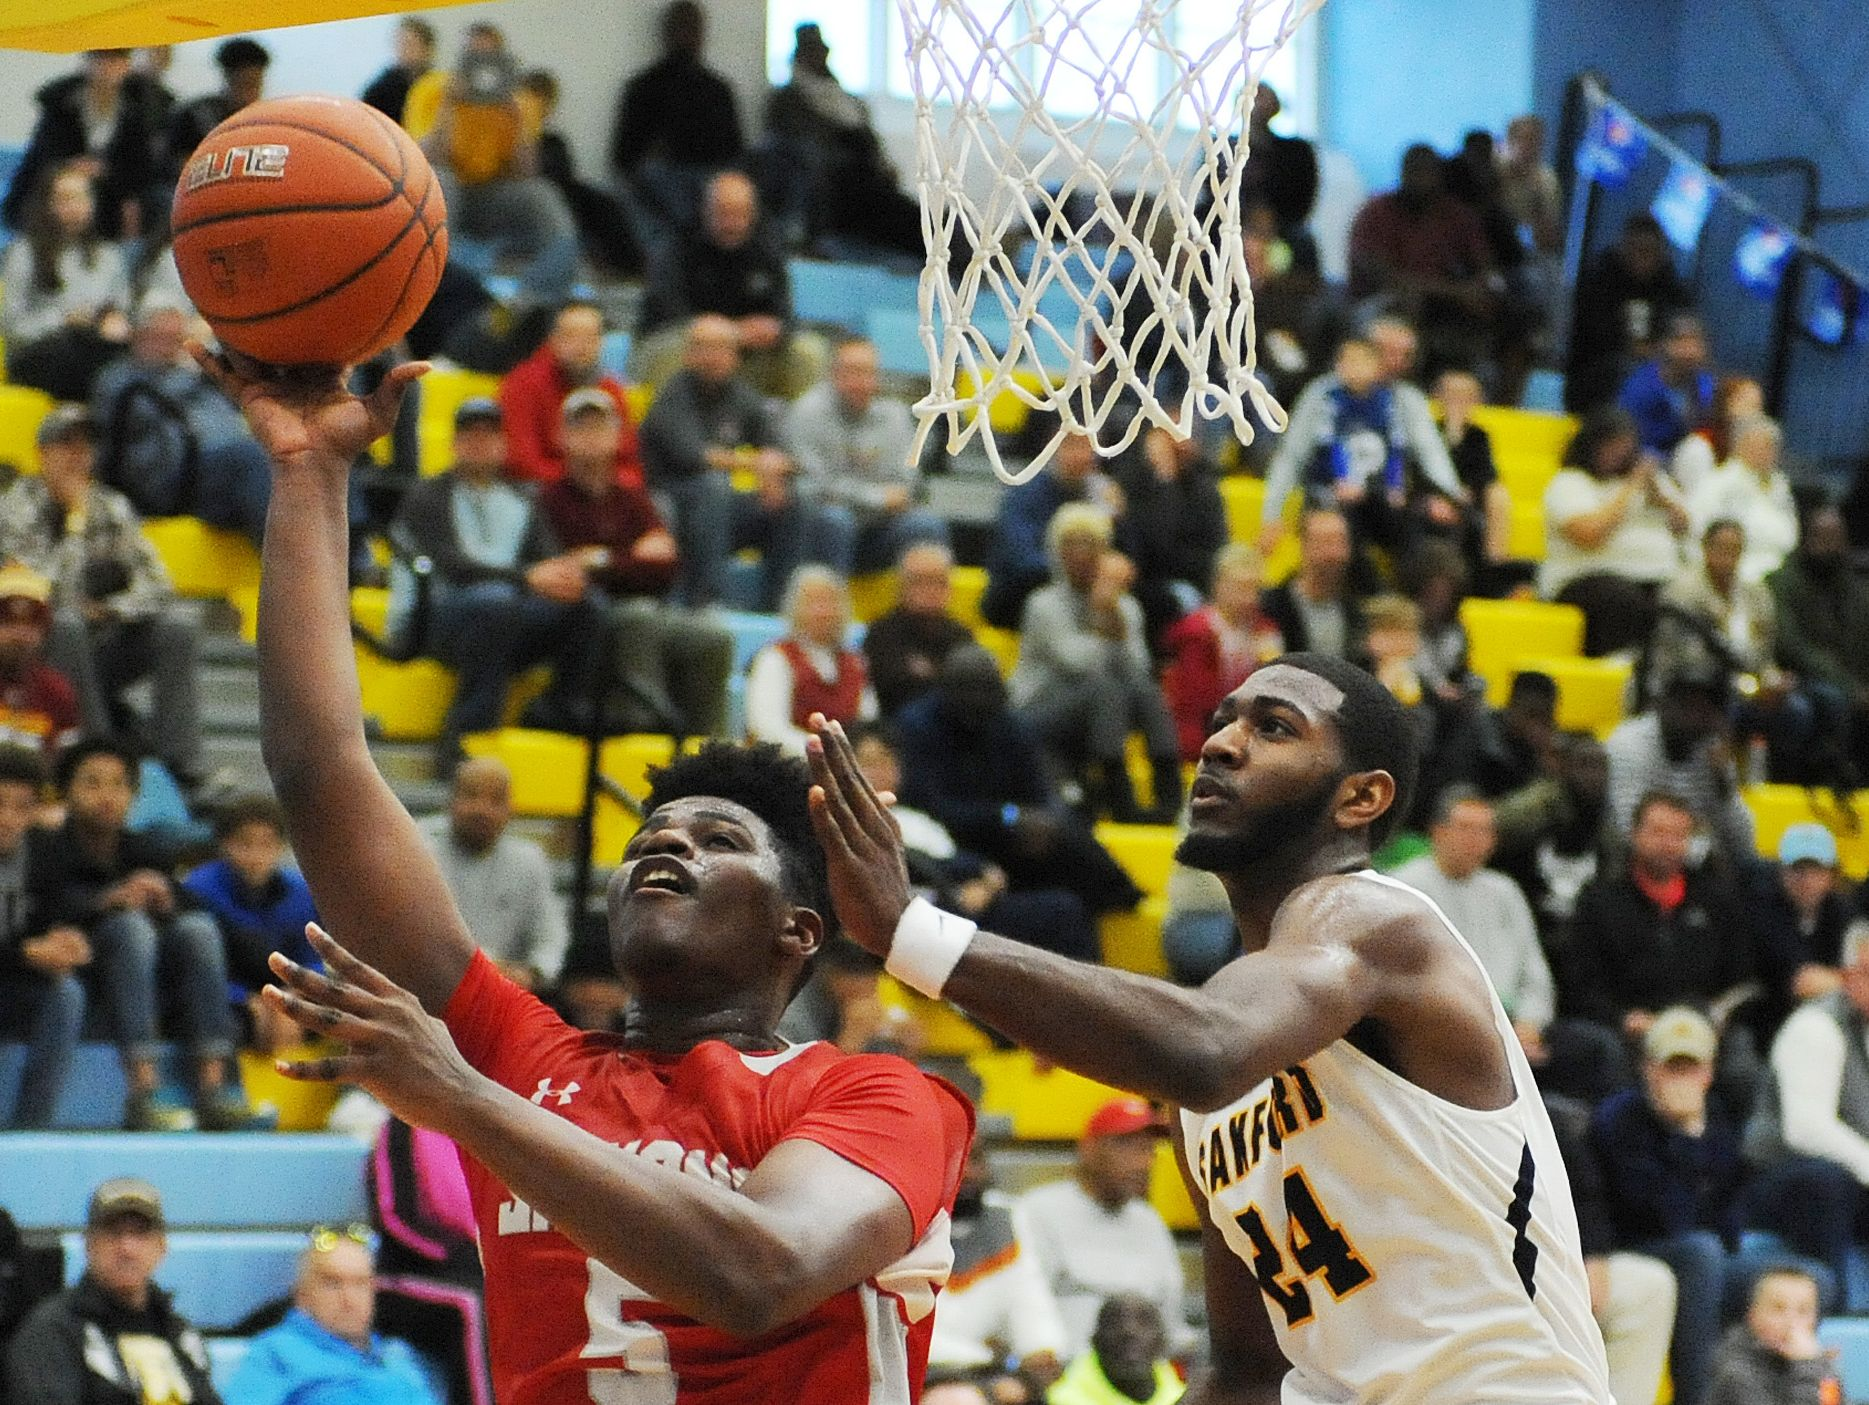 Smyrna's Jaymeir Garnett (5) makes a basket over Sanford's Marcus McCollum.